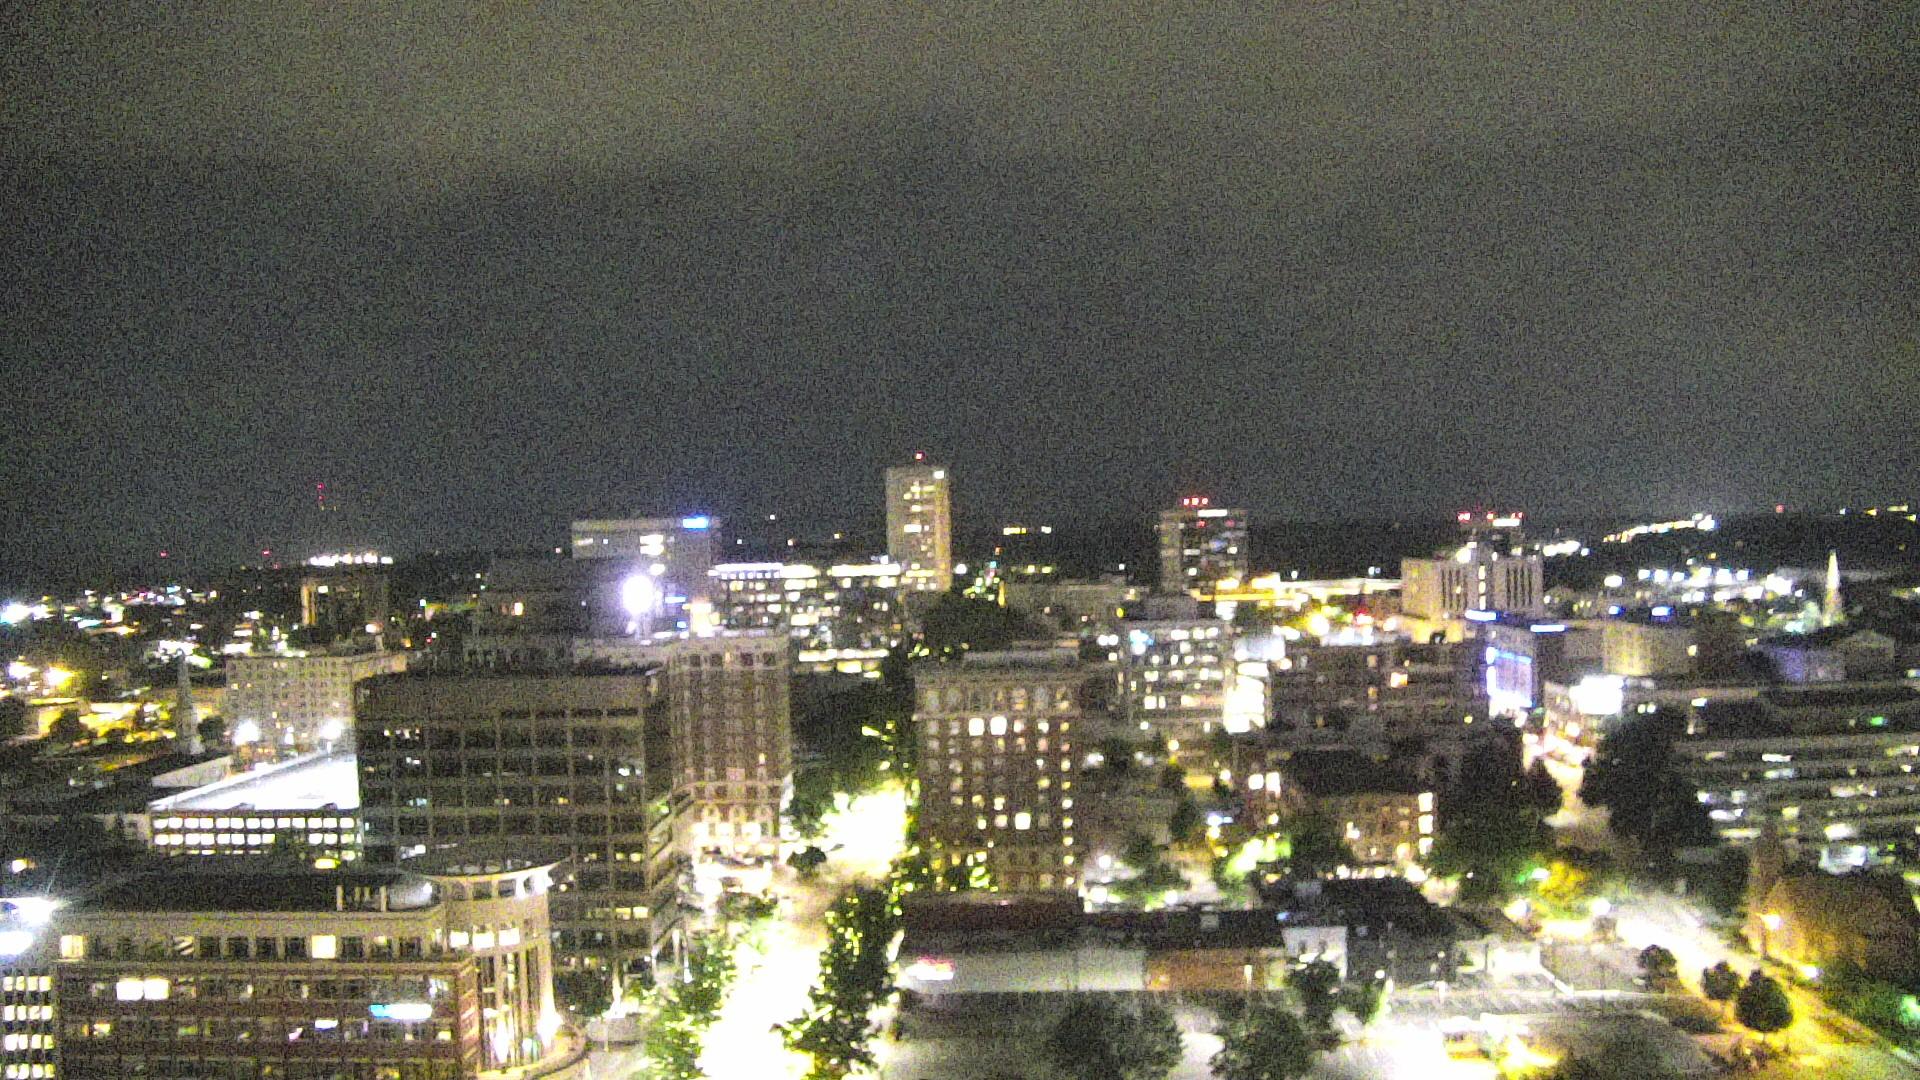 downtown greenville webcam